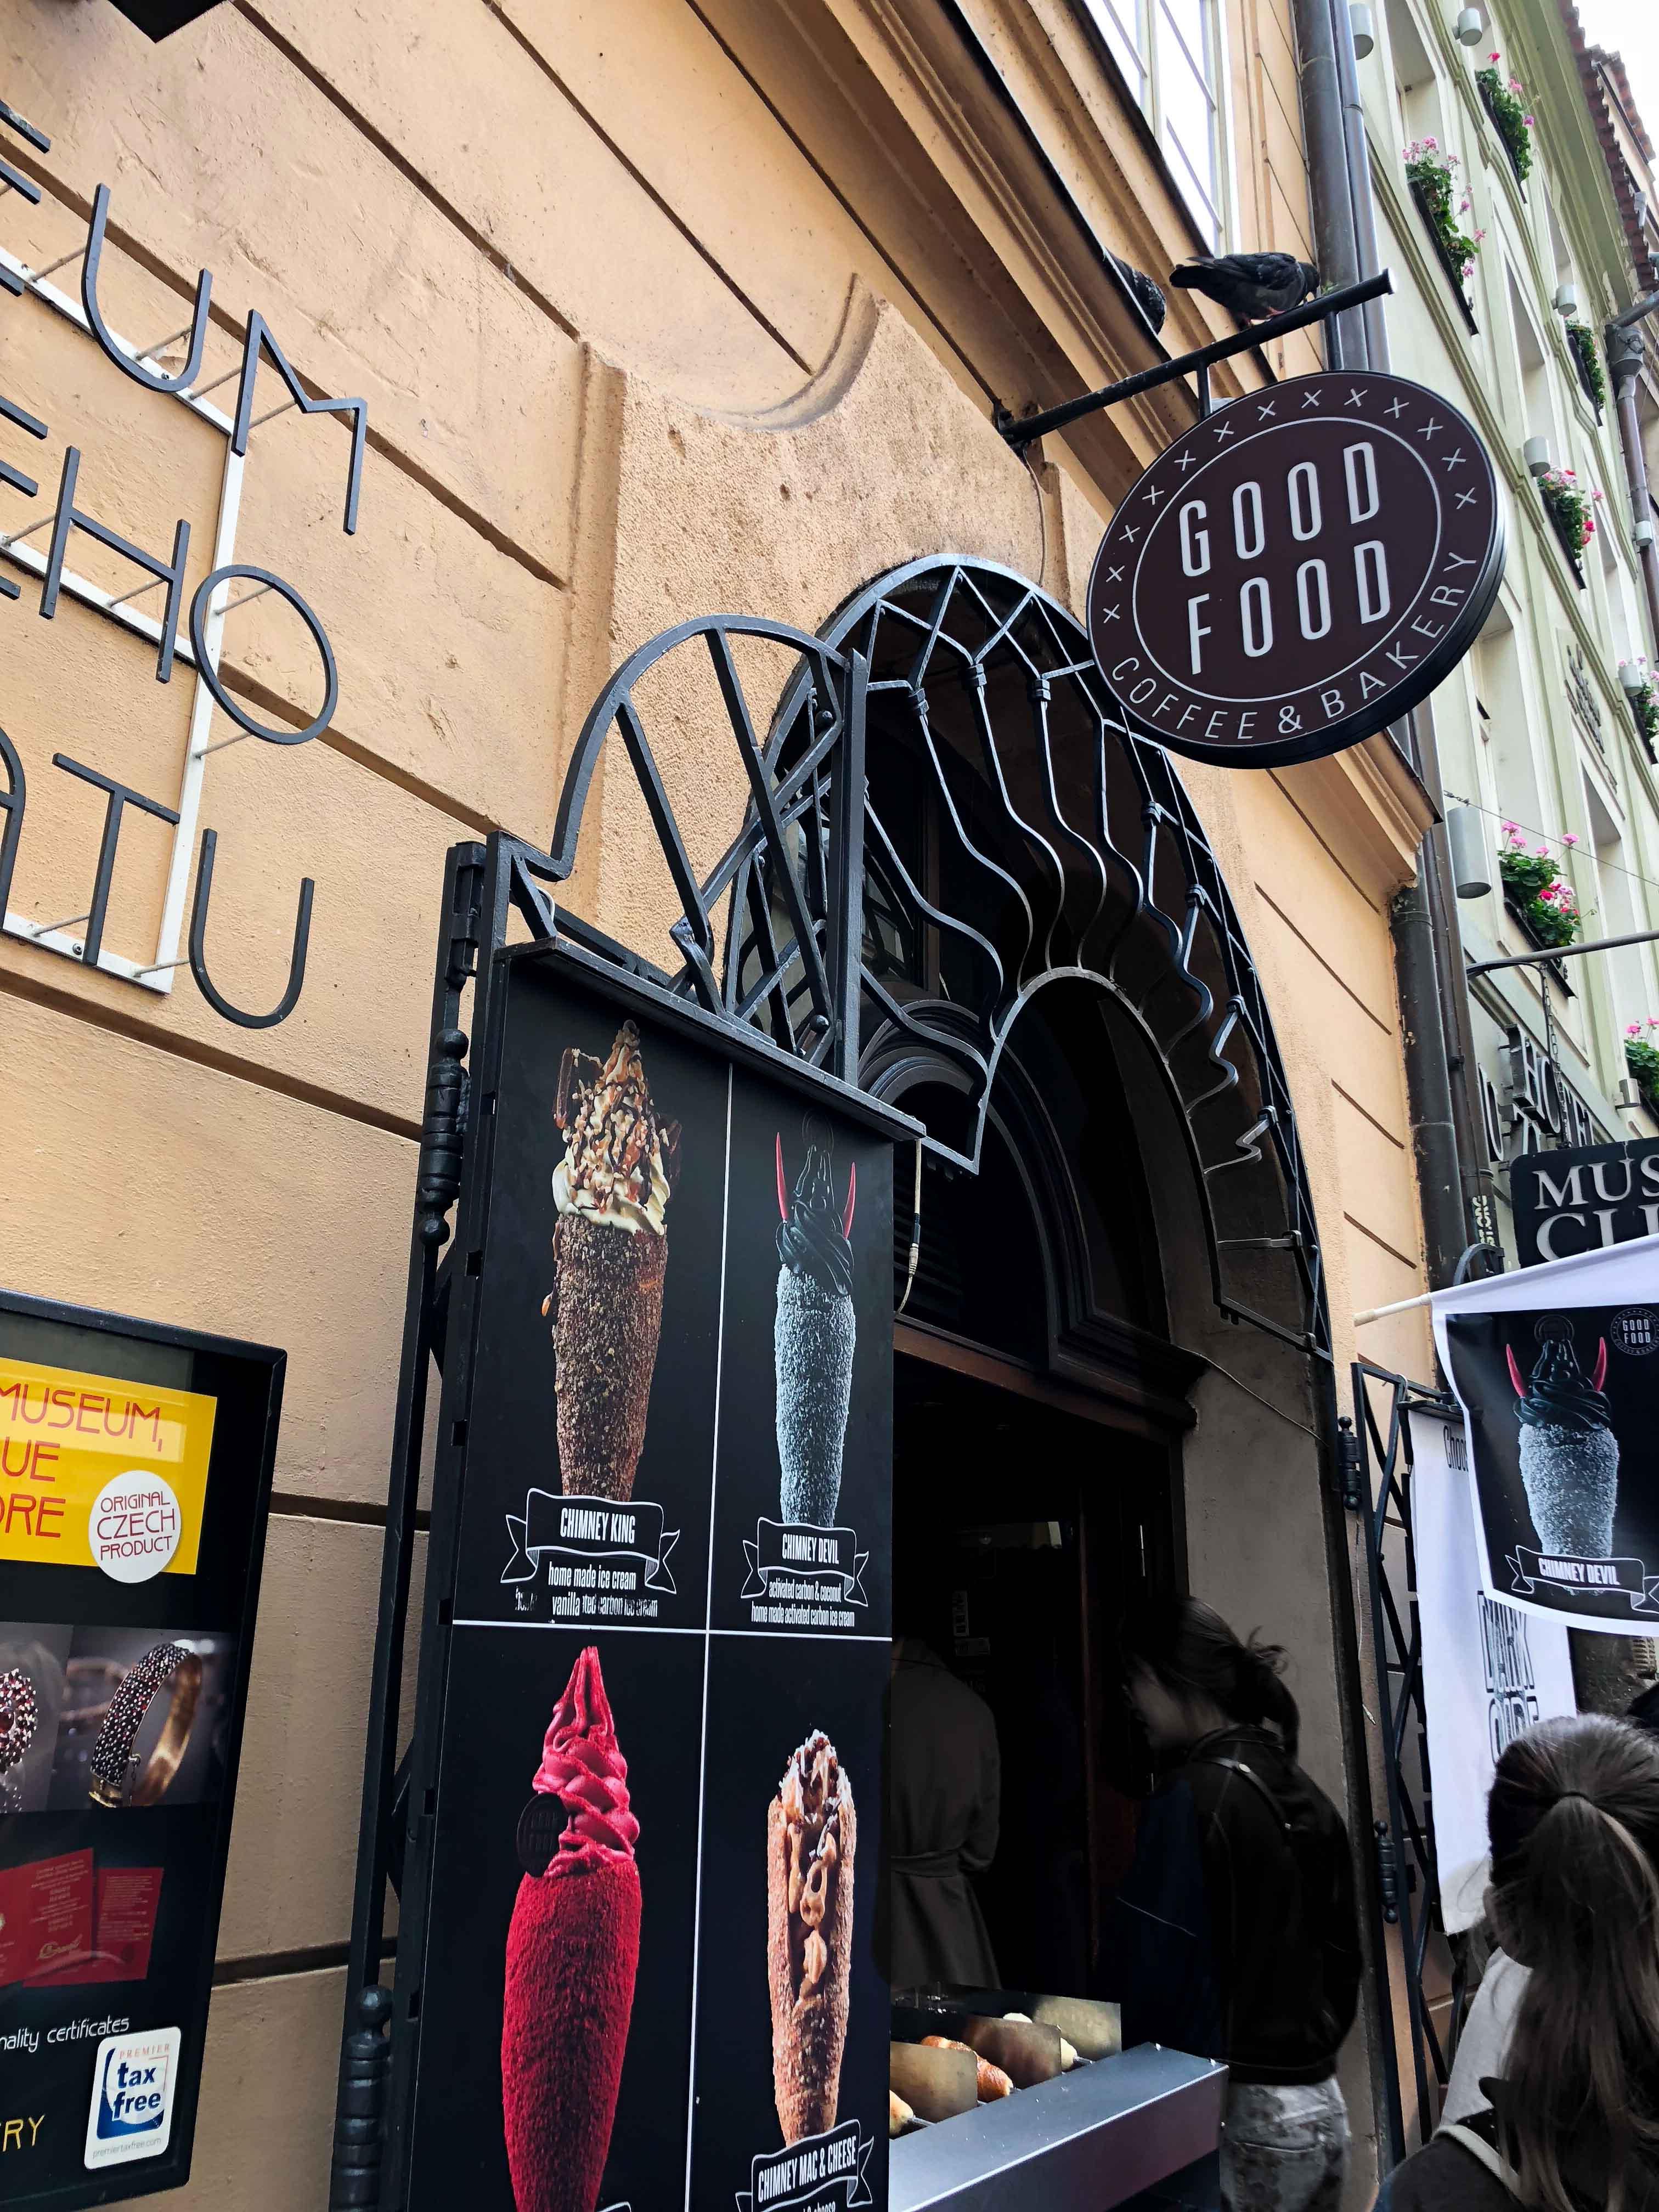 Good Food Coffee Bakery Restaurant Insider Tipps Prag Food Tipps besten Restaurants Tredlnik Bamstriezel Reiseblog